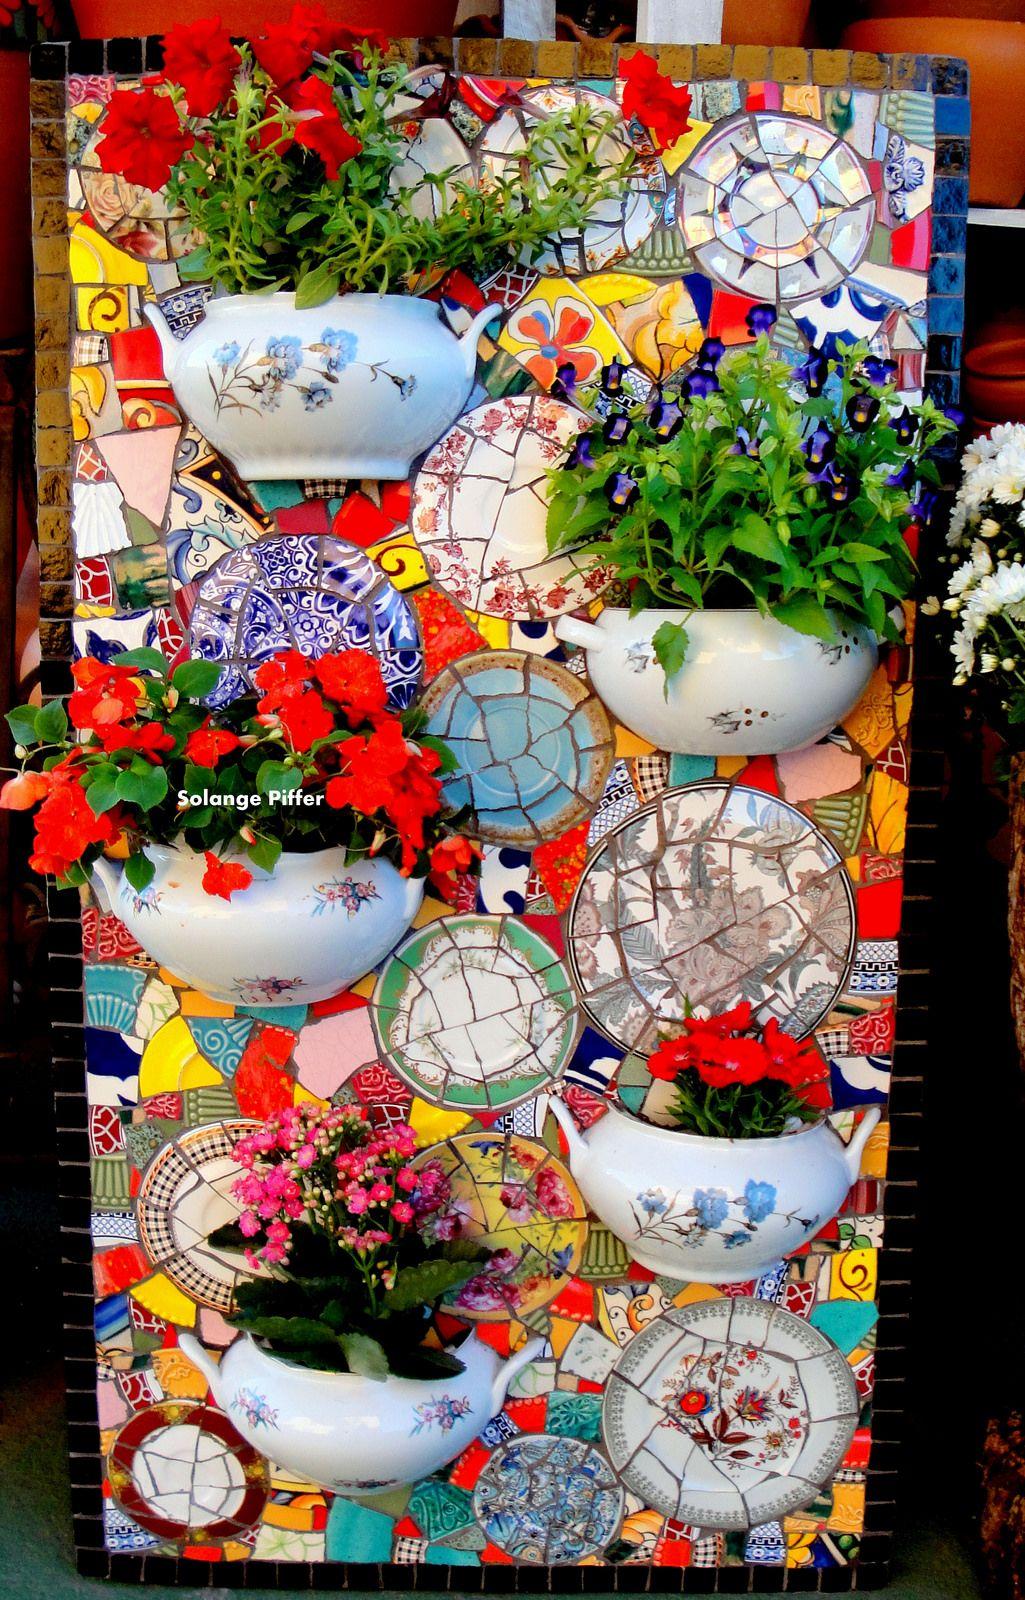 041 Solange Piffer Flickr Art Fair Display Mosaic